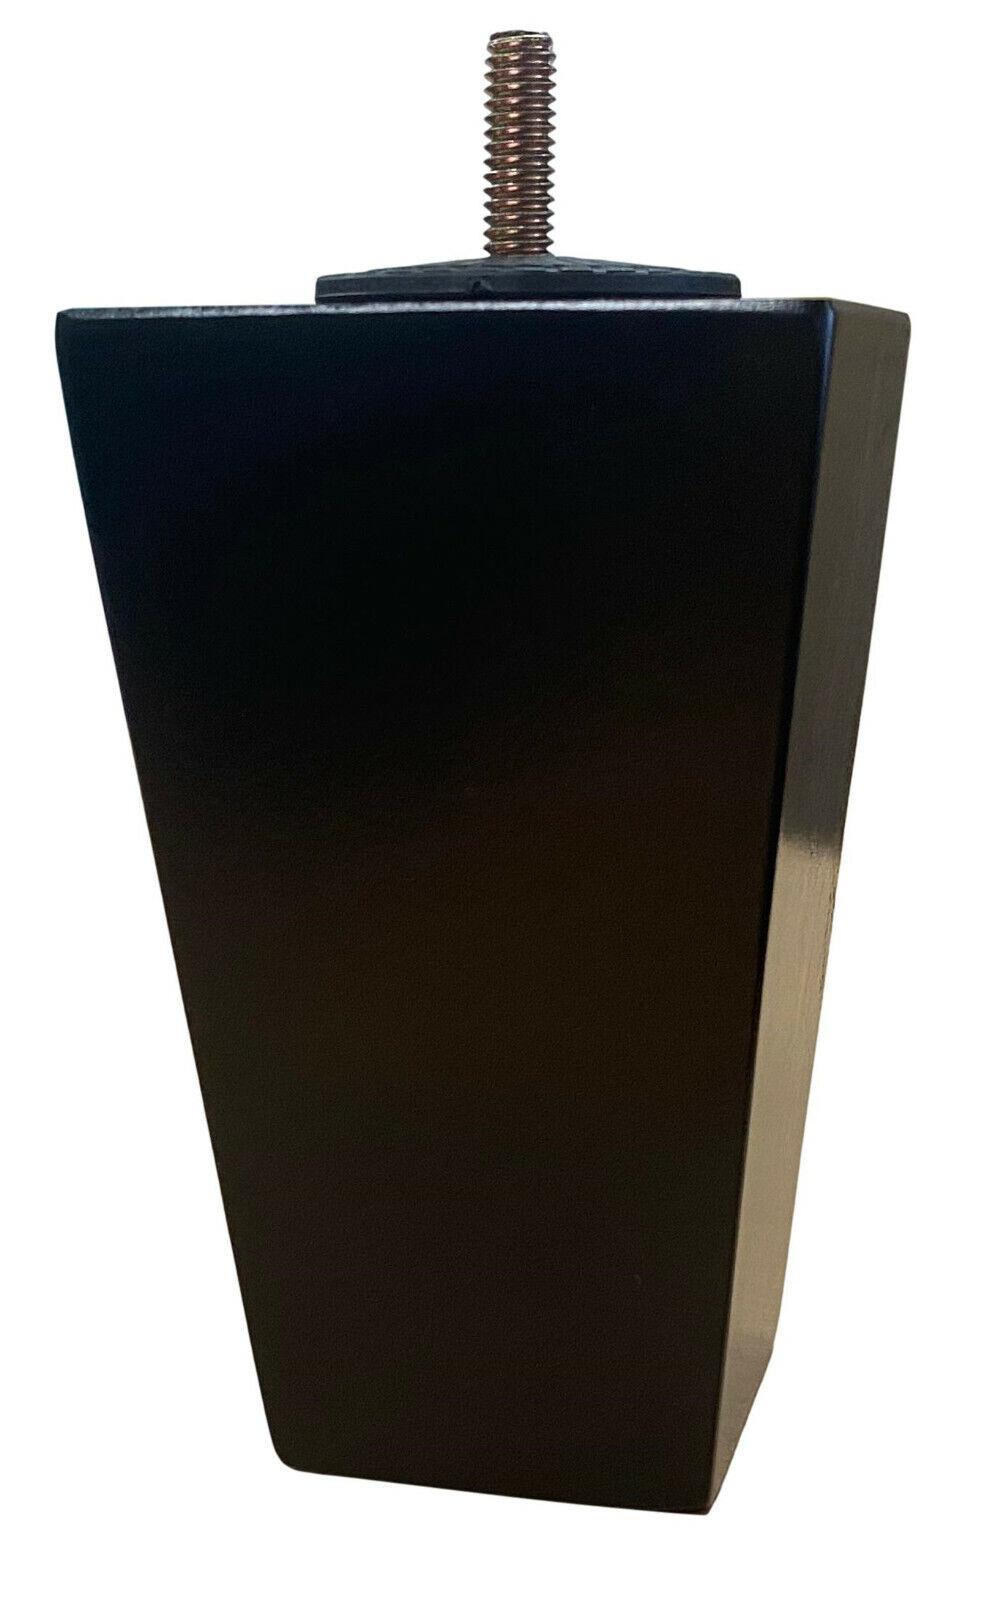 2″ Short Height Medium Walnut Tapered Sofa Ottoman Furniture Legs – Set of 4 Furniture